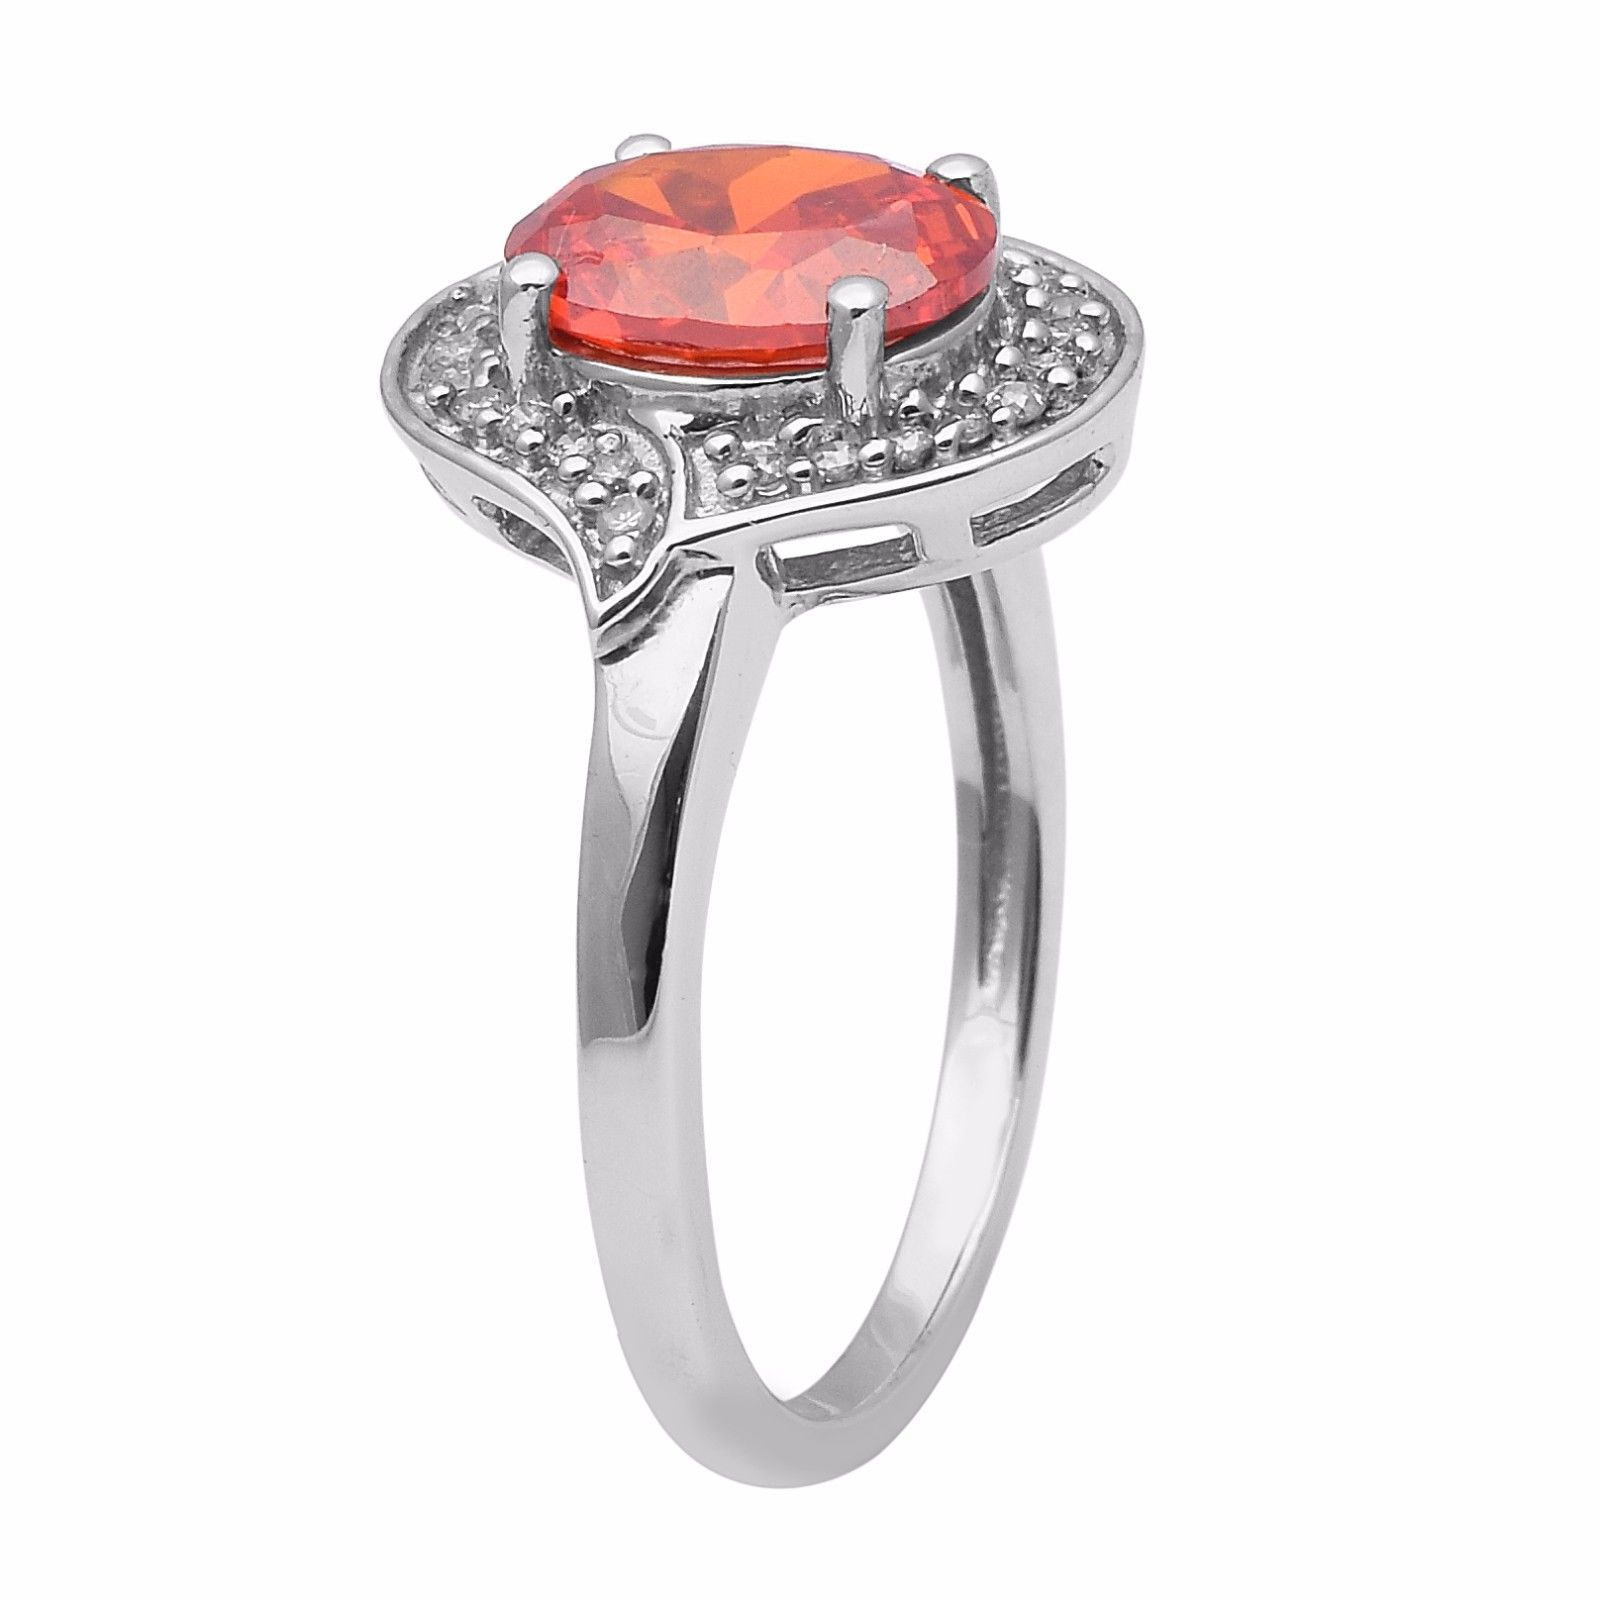 Orange Color Cubic Zirconia Sterling Silver Ring Shine Jewelry Size-8 SHRI1365